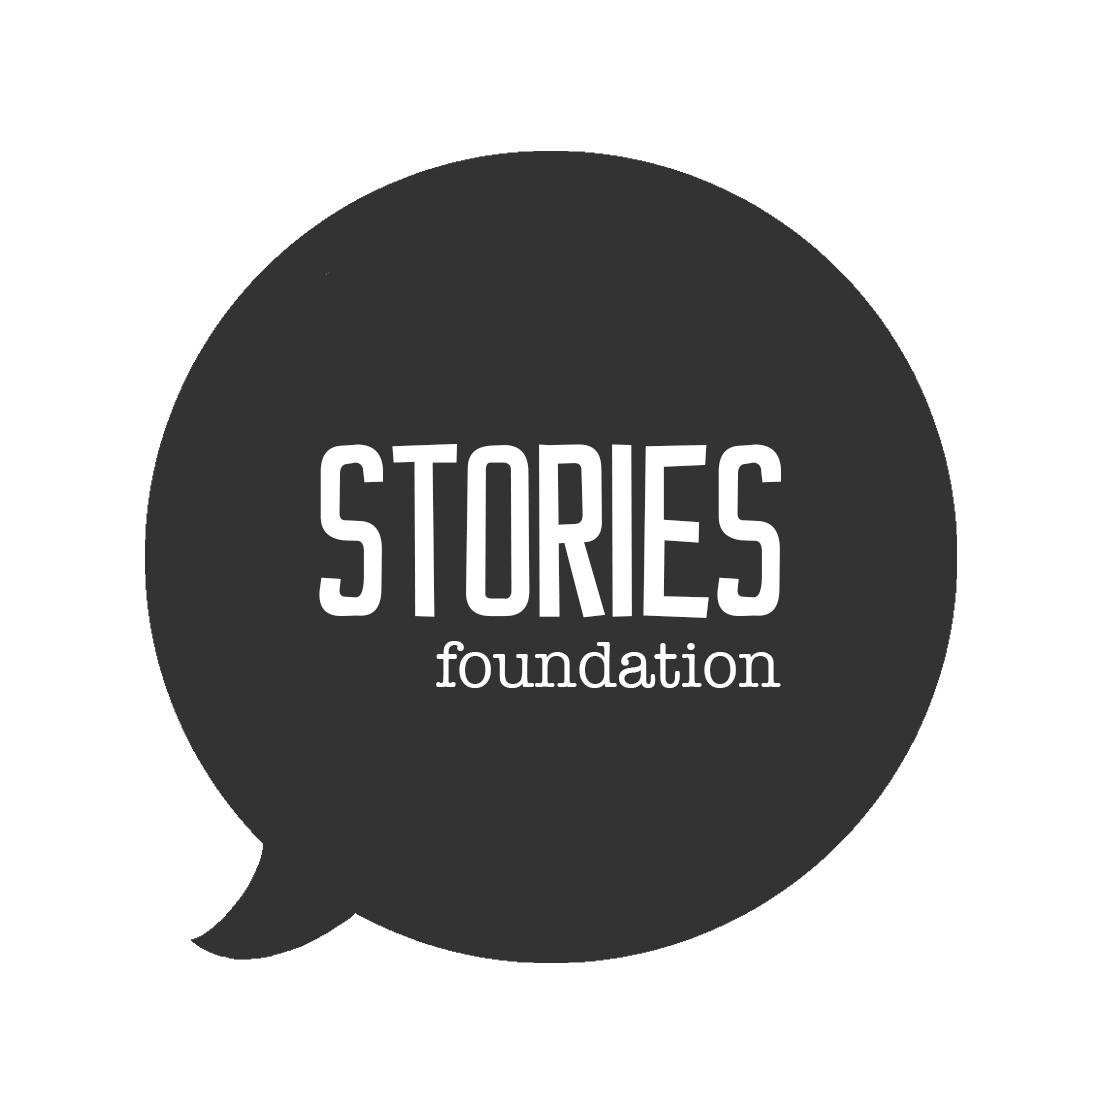 STORIES.foundation.LOGO new.jpg